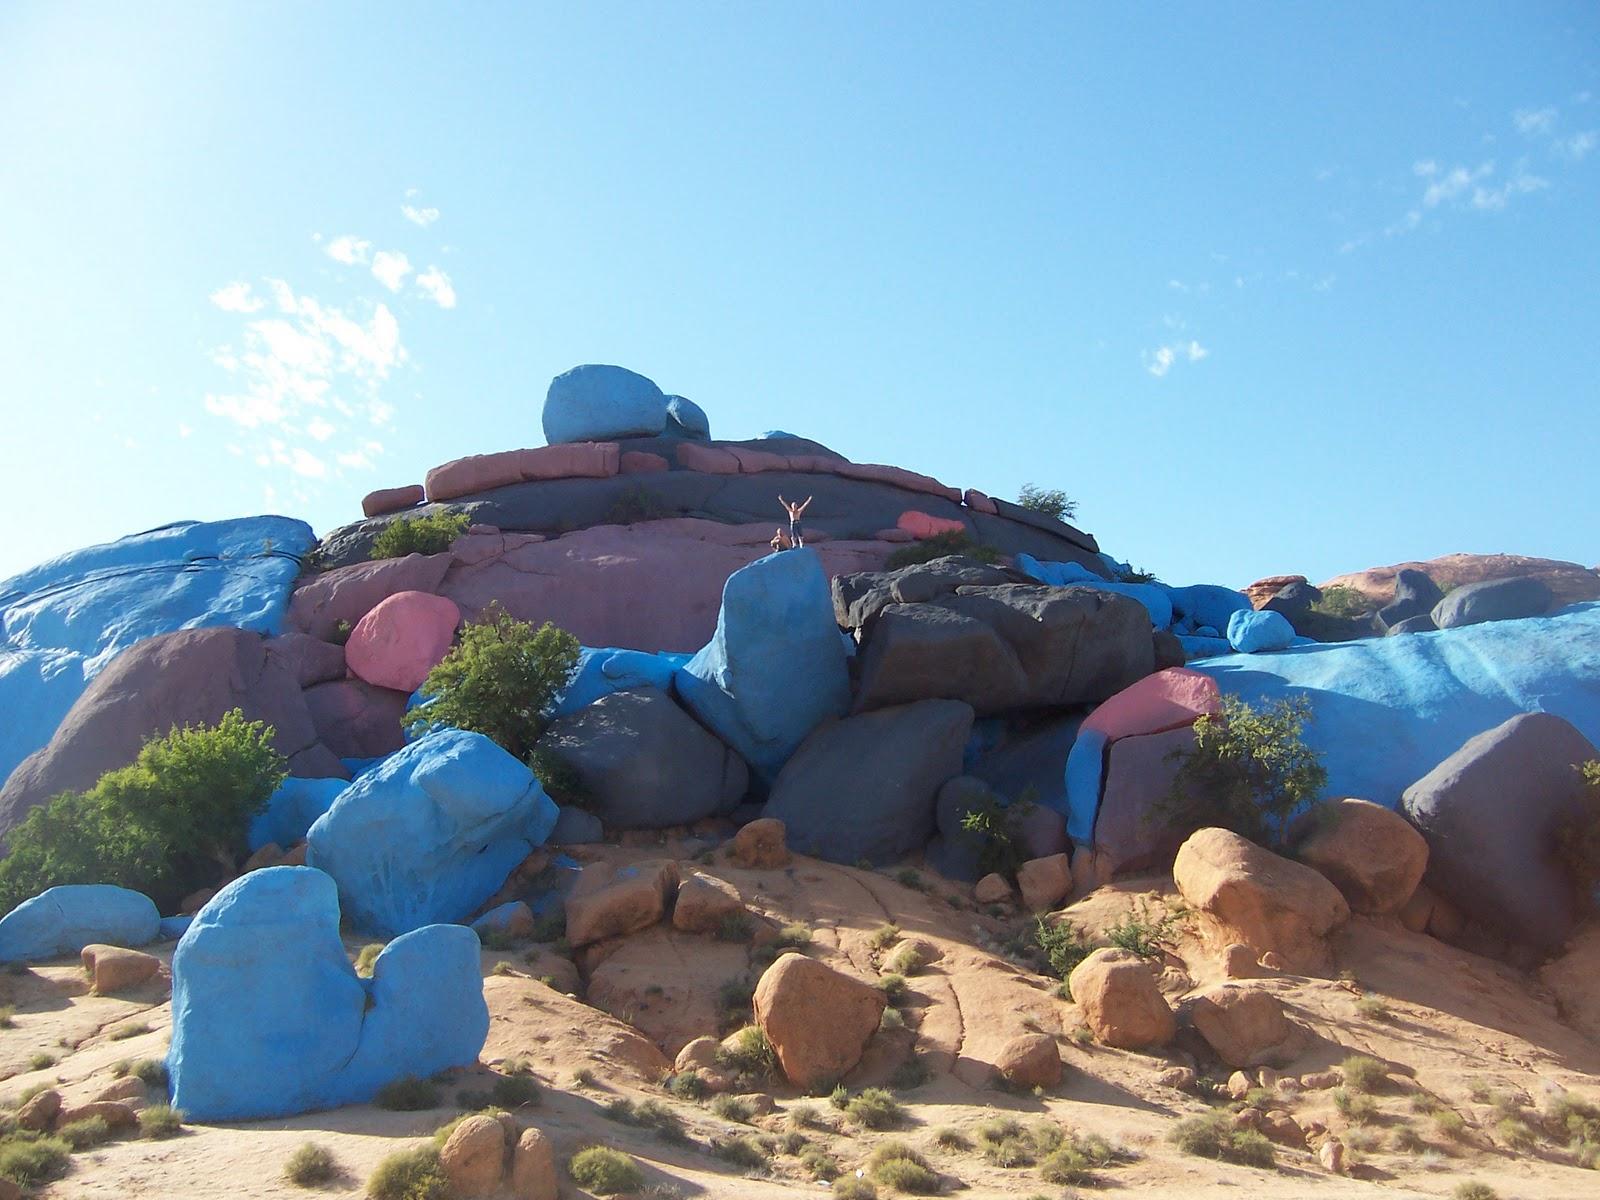 morocco-rochers-peints-tafraout1532103953.JPG